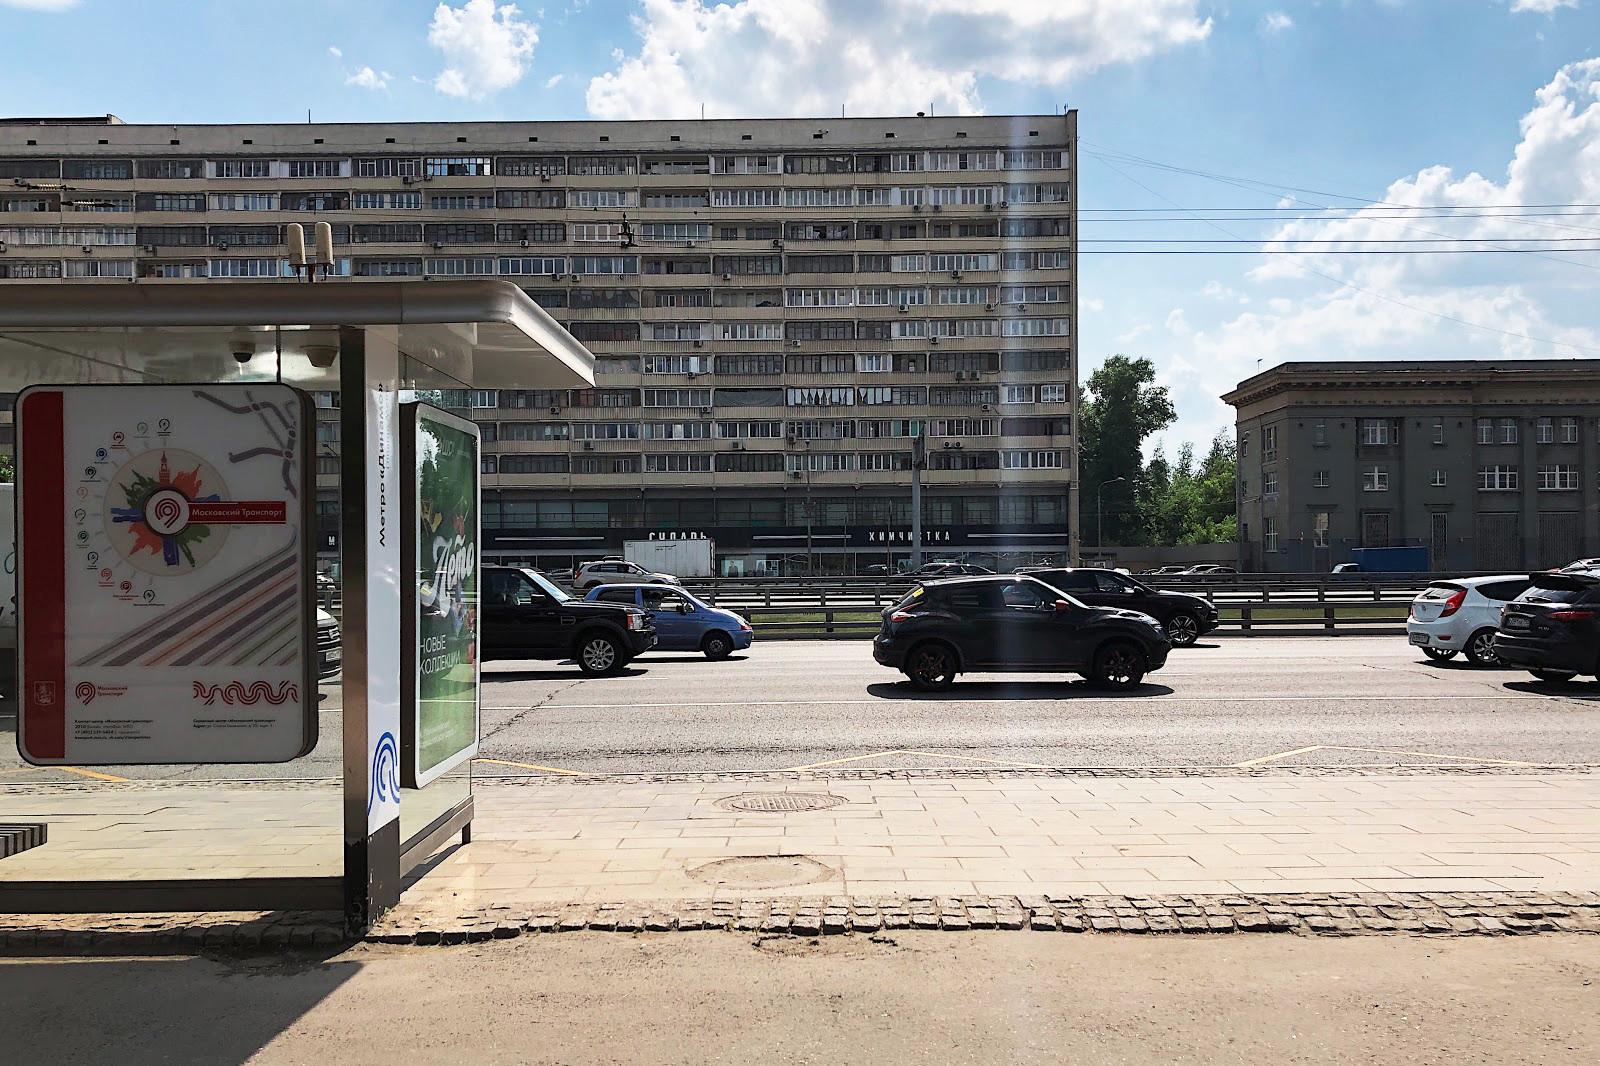 Жилищна сграда на Ленинградски проспект. Построена е през 1964 г. за работниците на ОКБ-155 – авиостроителен завод